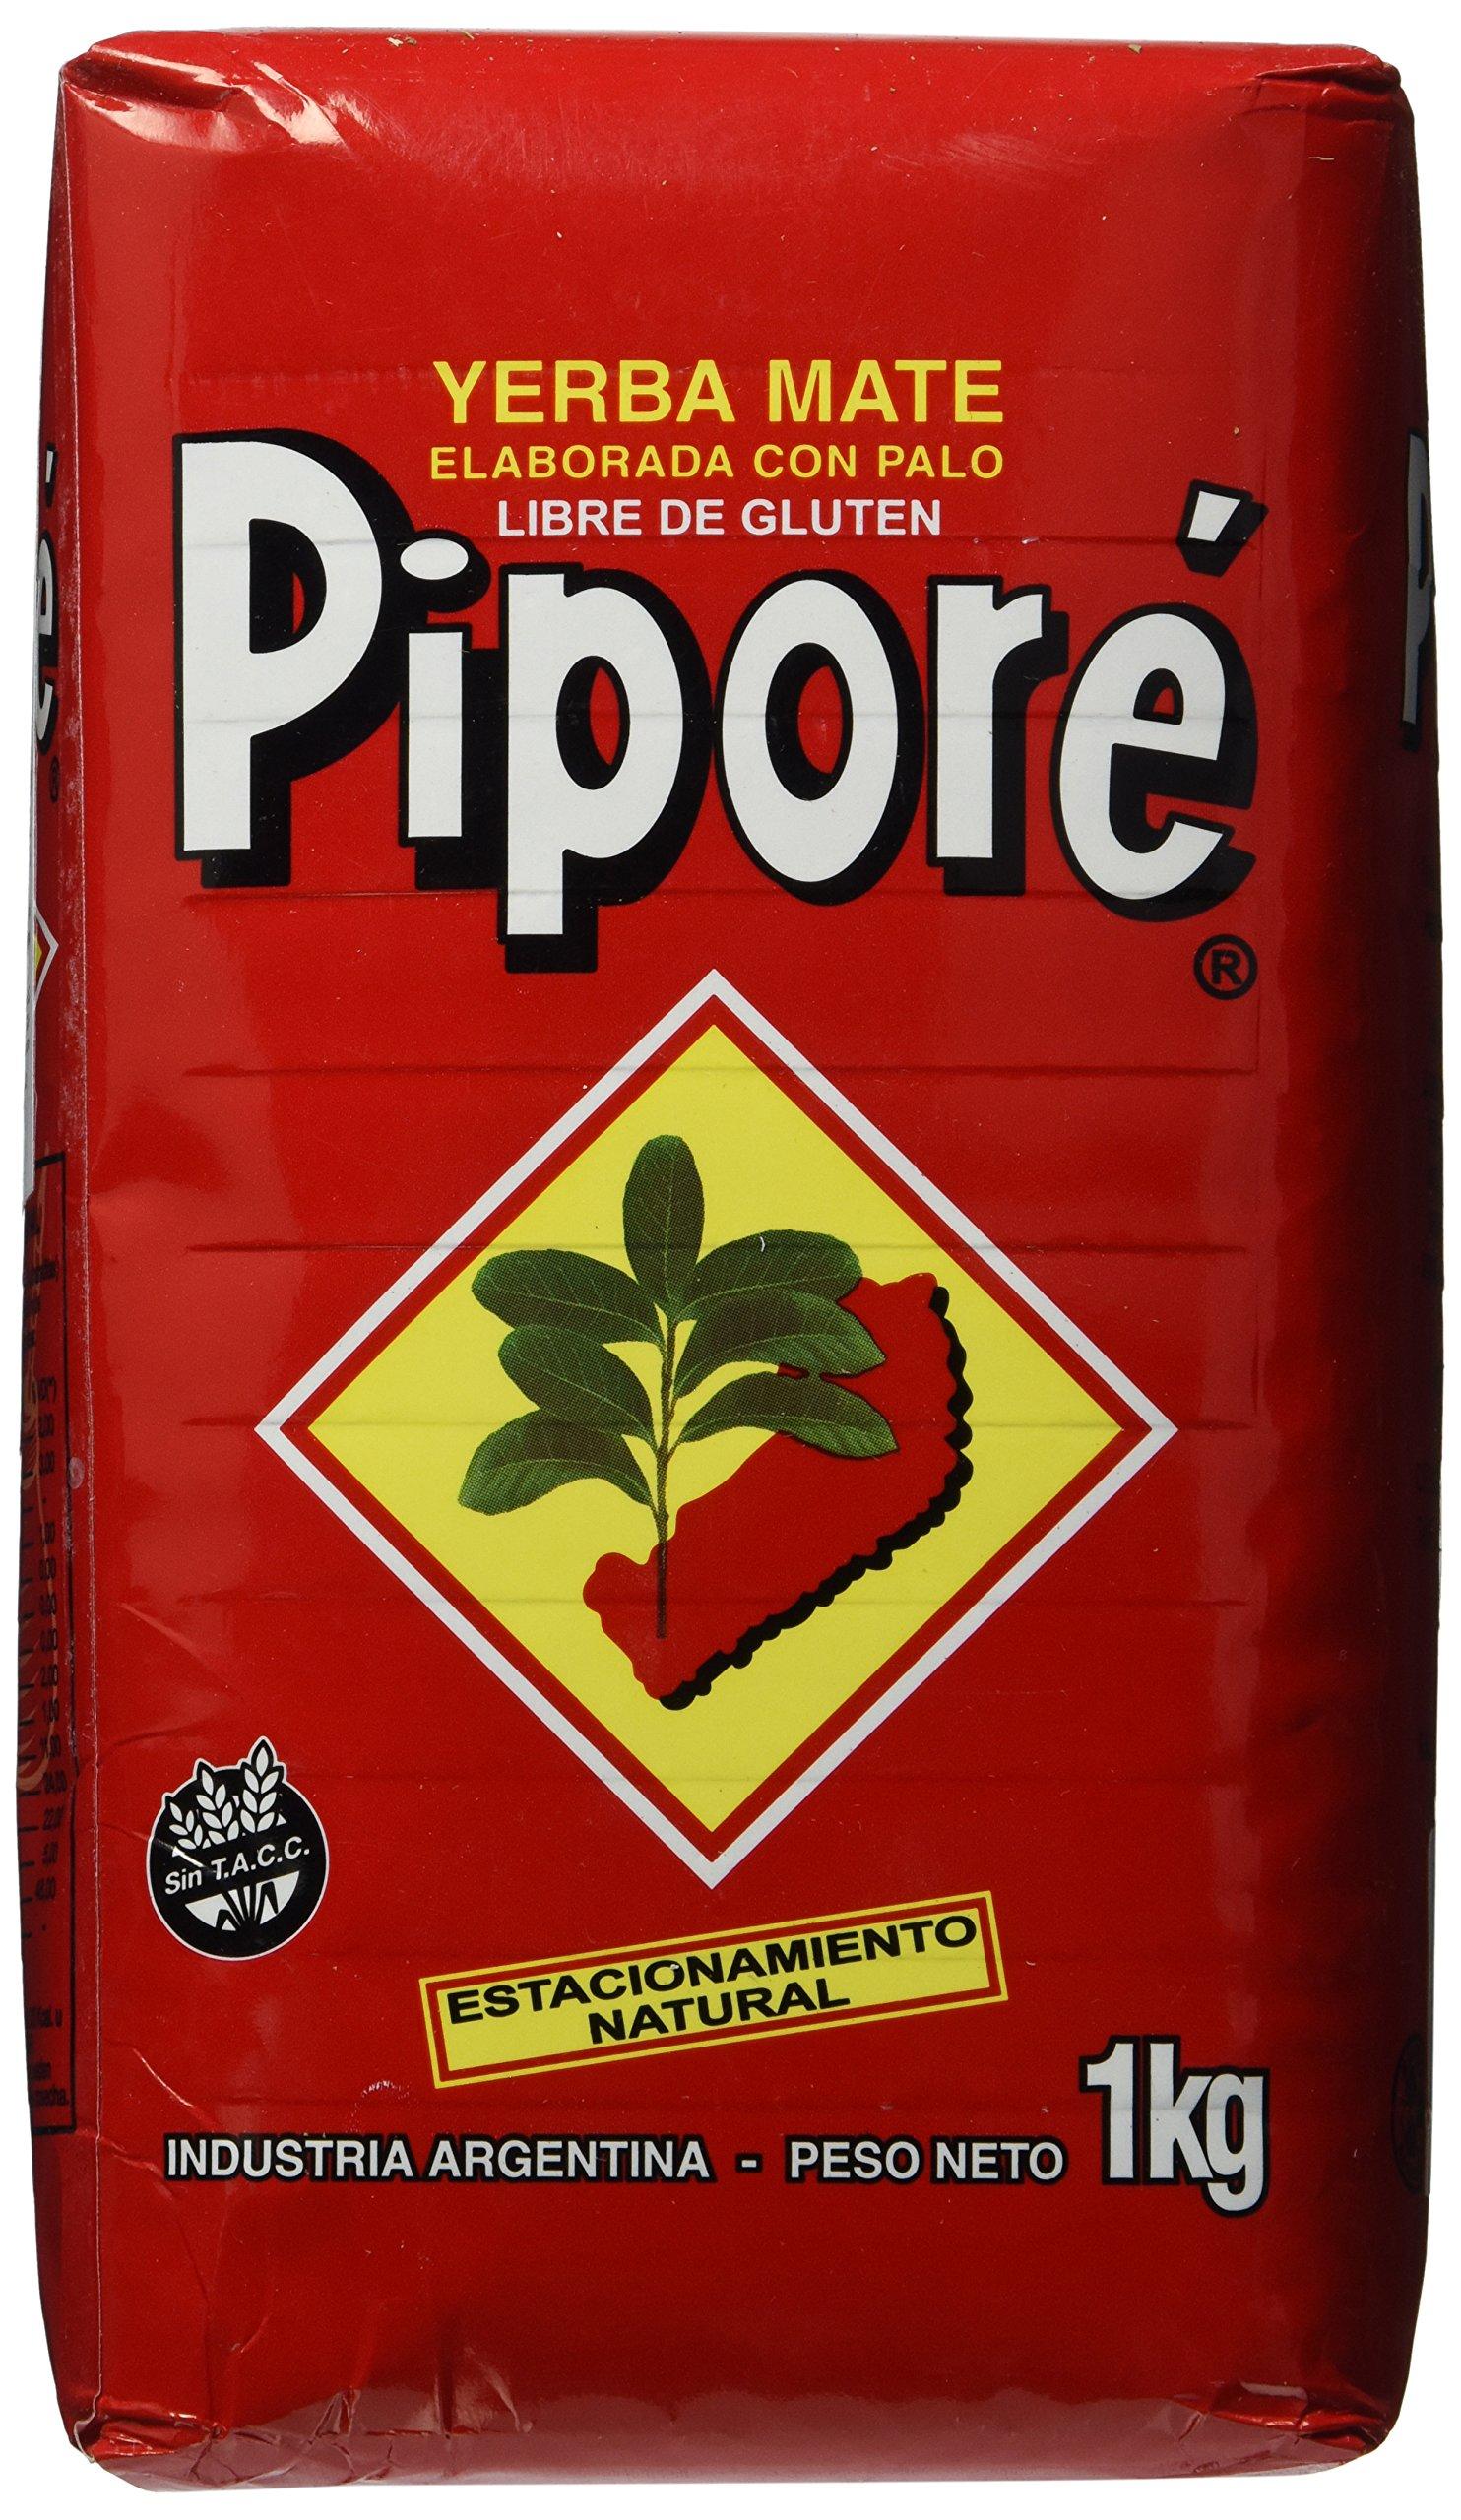 Yerba Mate Pipore - Regular - 2.2 Lbs - 1 Kilo - Gluten Free